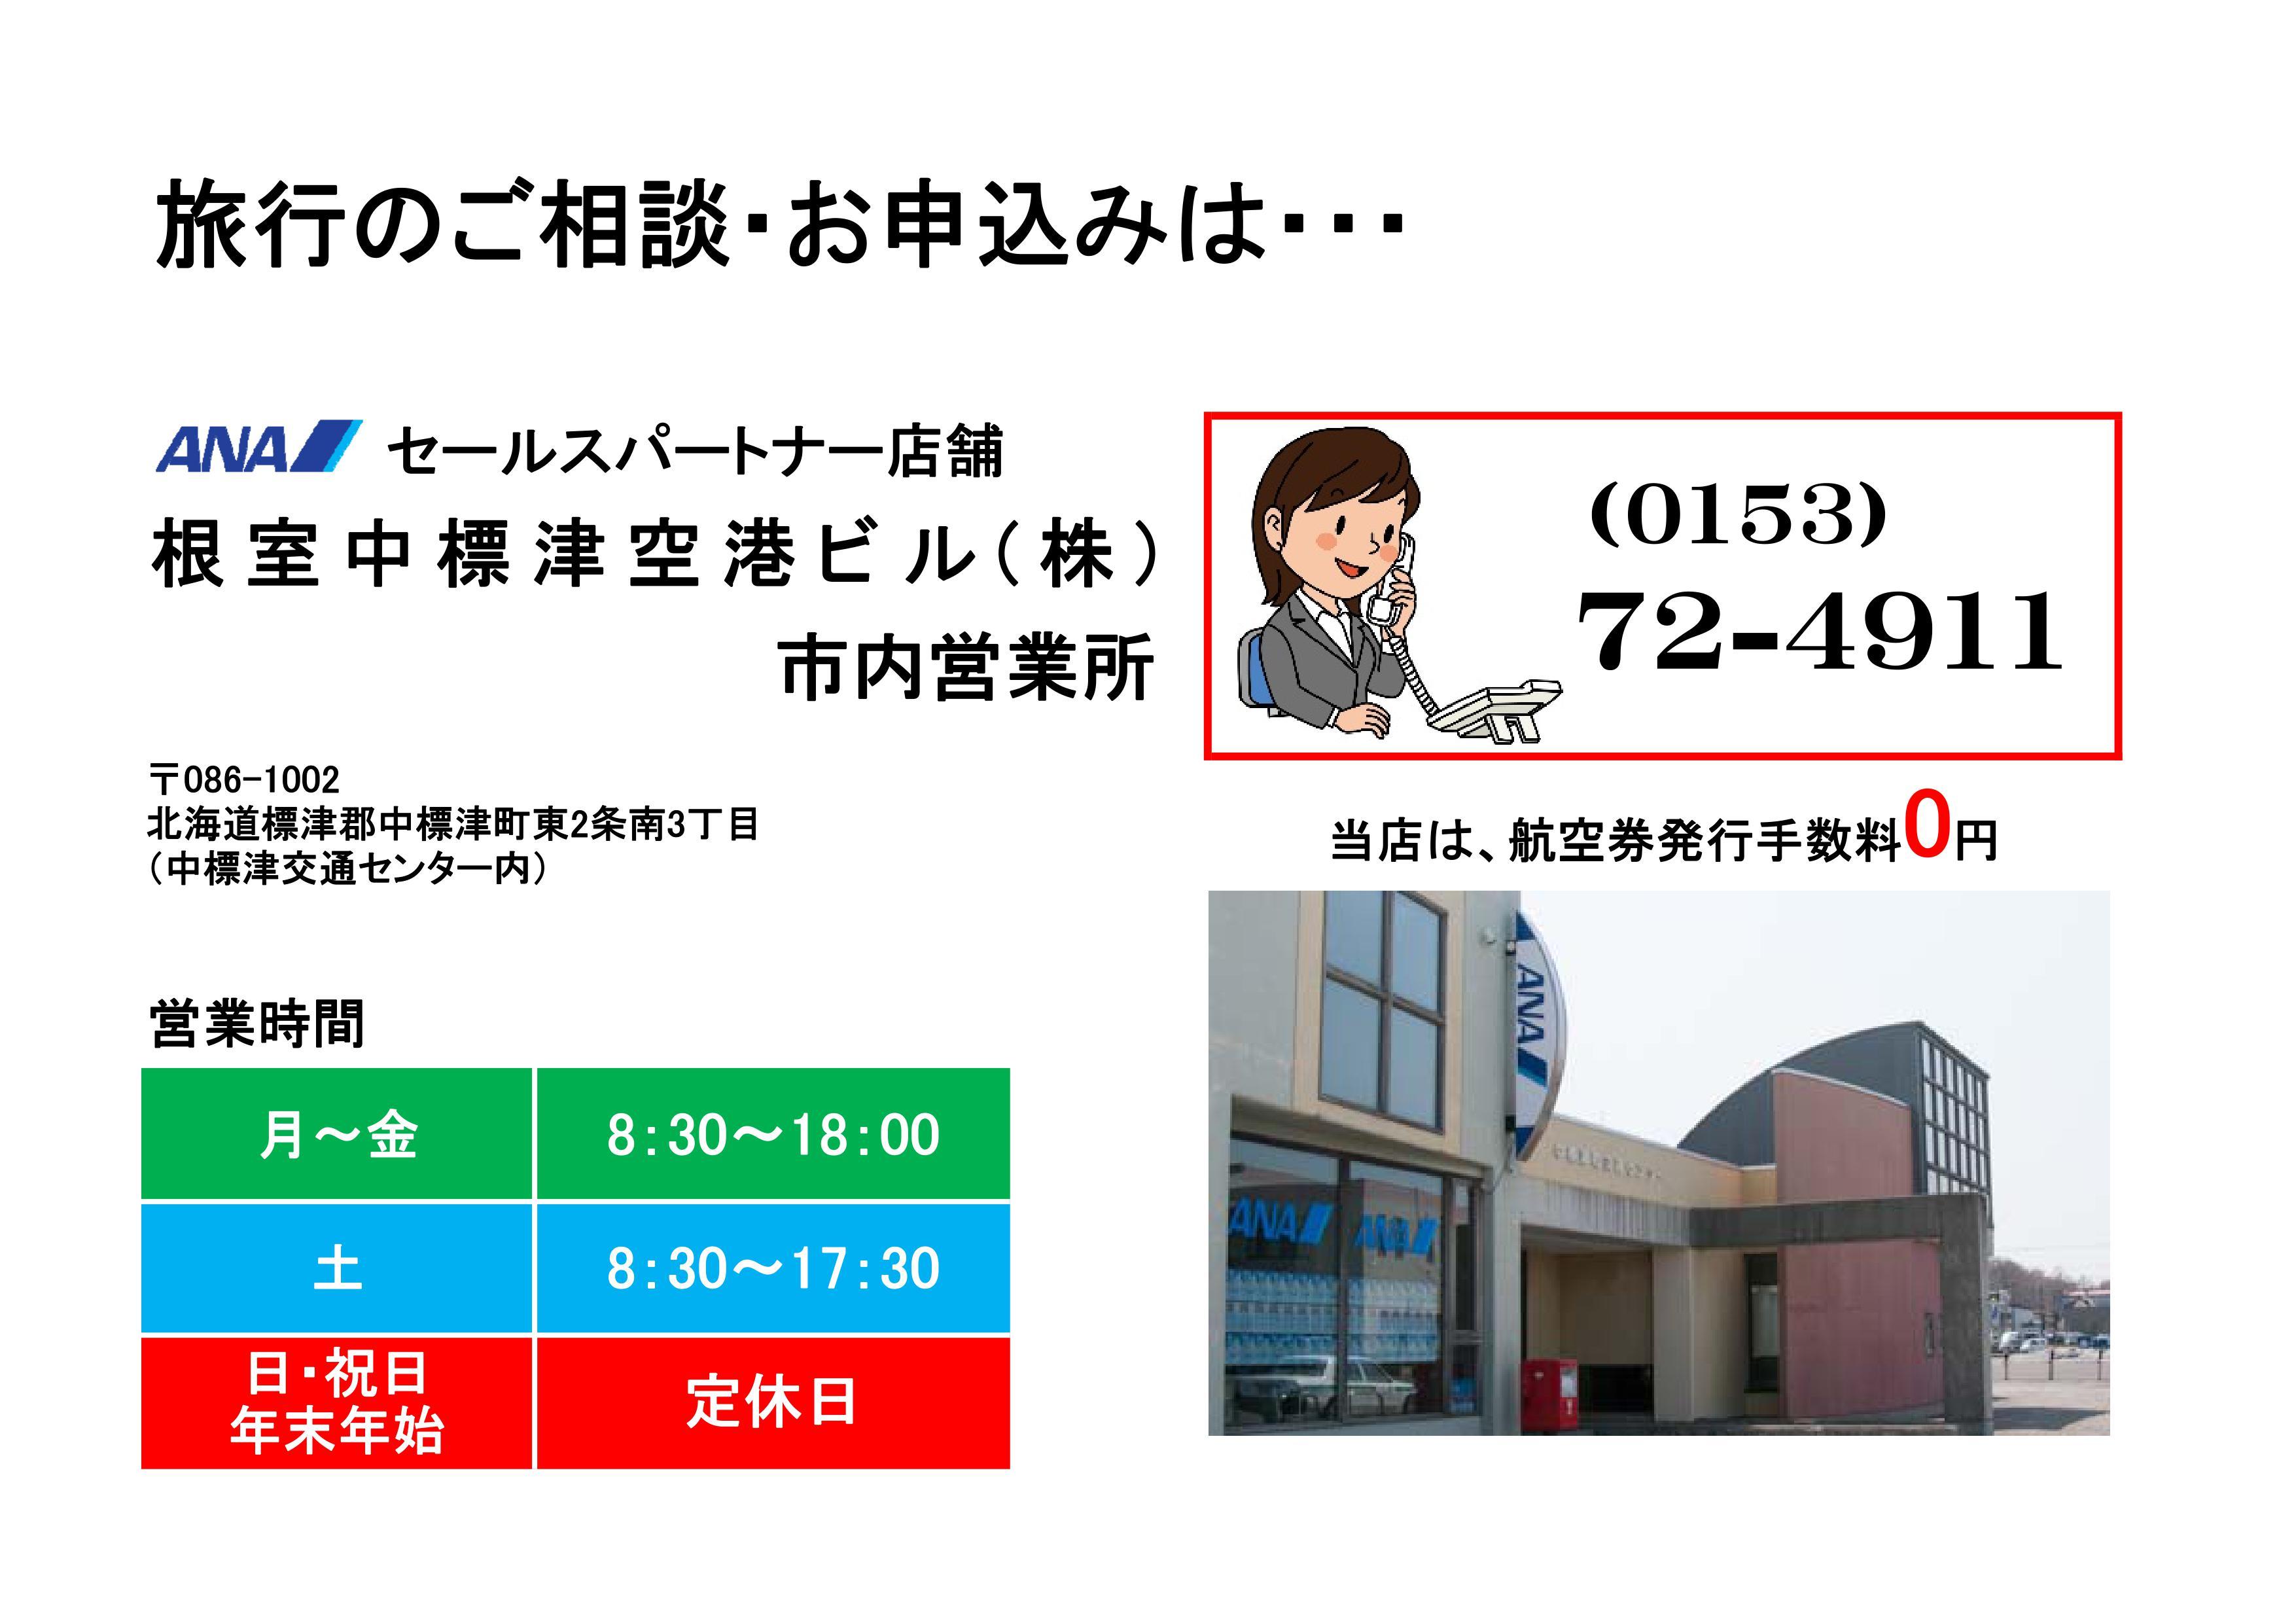 http://www.nakashibetsu-airport.jp/%E5%96%B6%E6%A5%AD%E6%99%82%E9%96%93%E6%8E%B2%E8%BC%89%282017%29.jpg